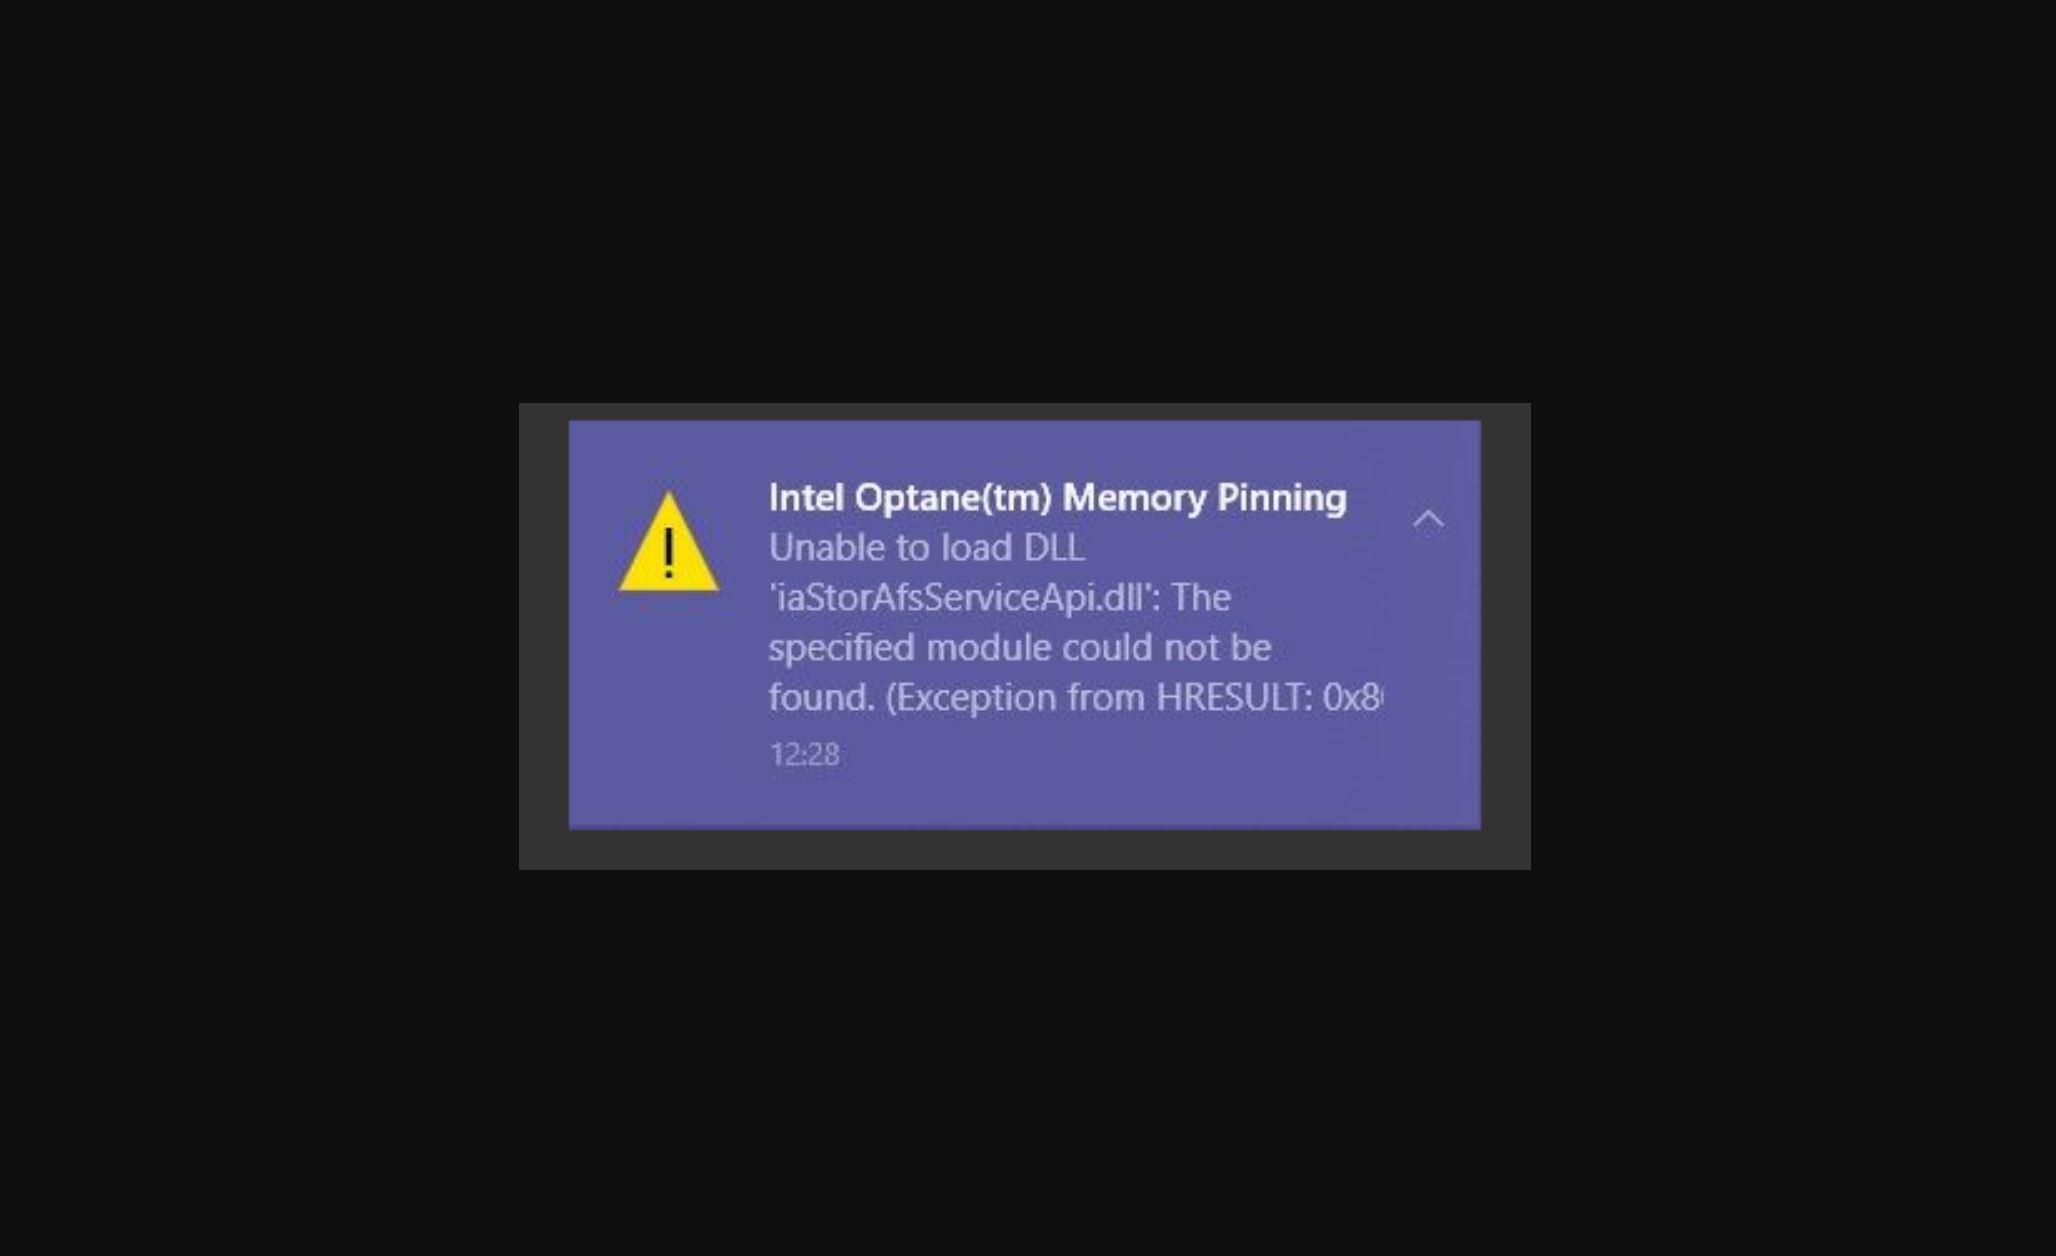 Optane Memory Pinning Error